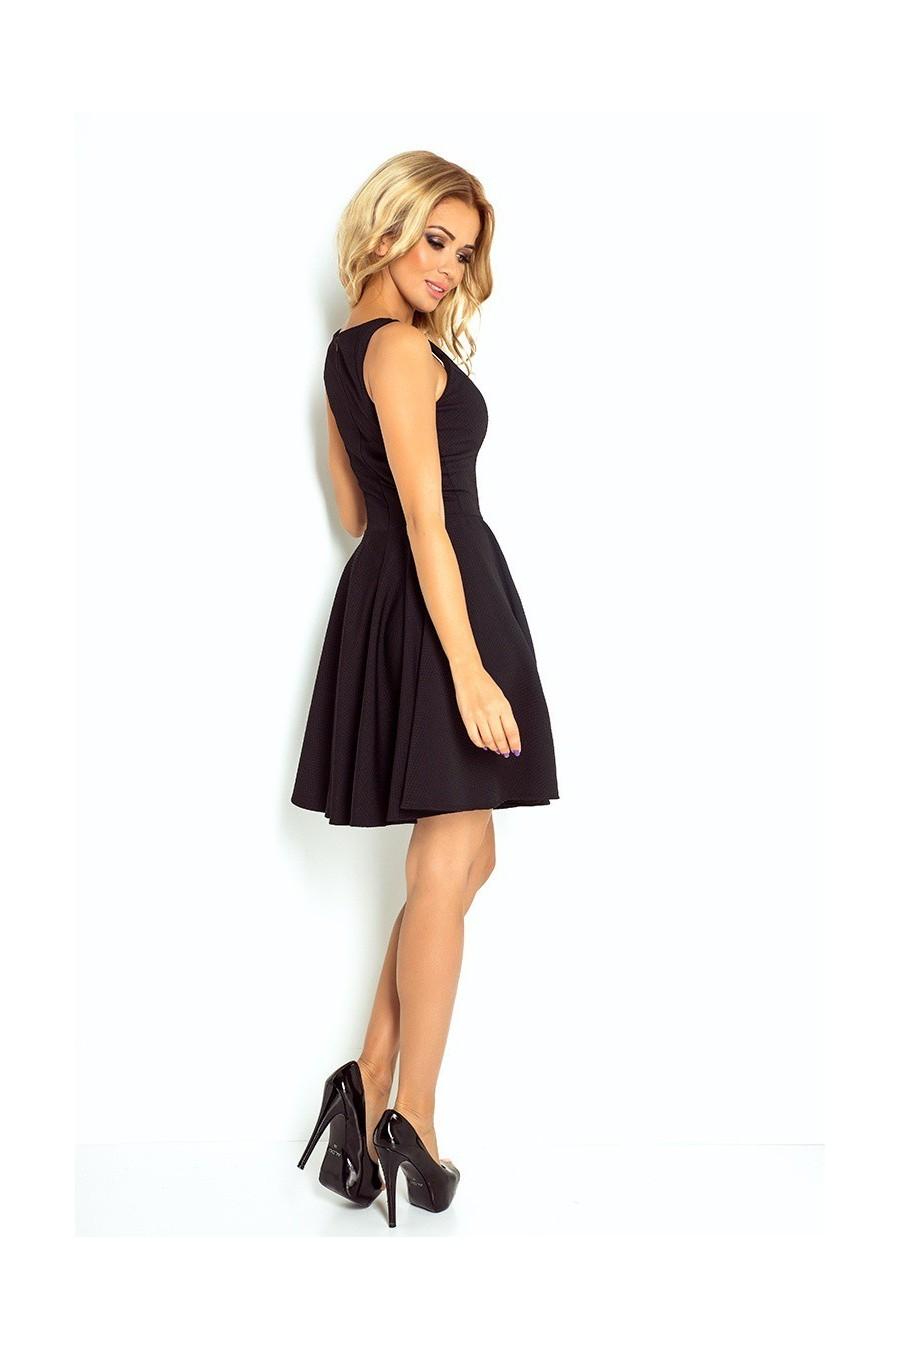 šaty - cerne 125-5